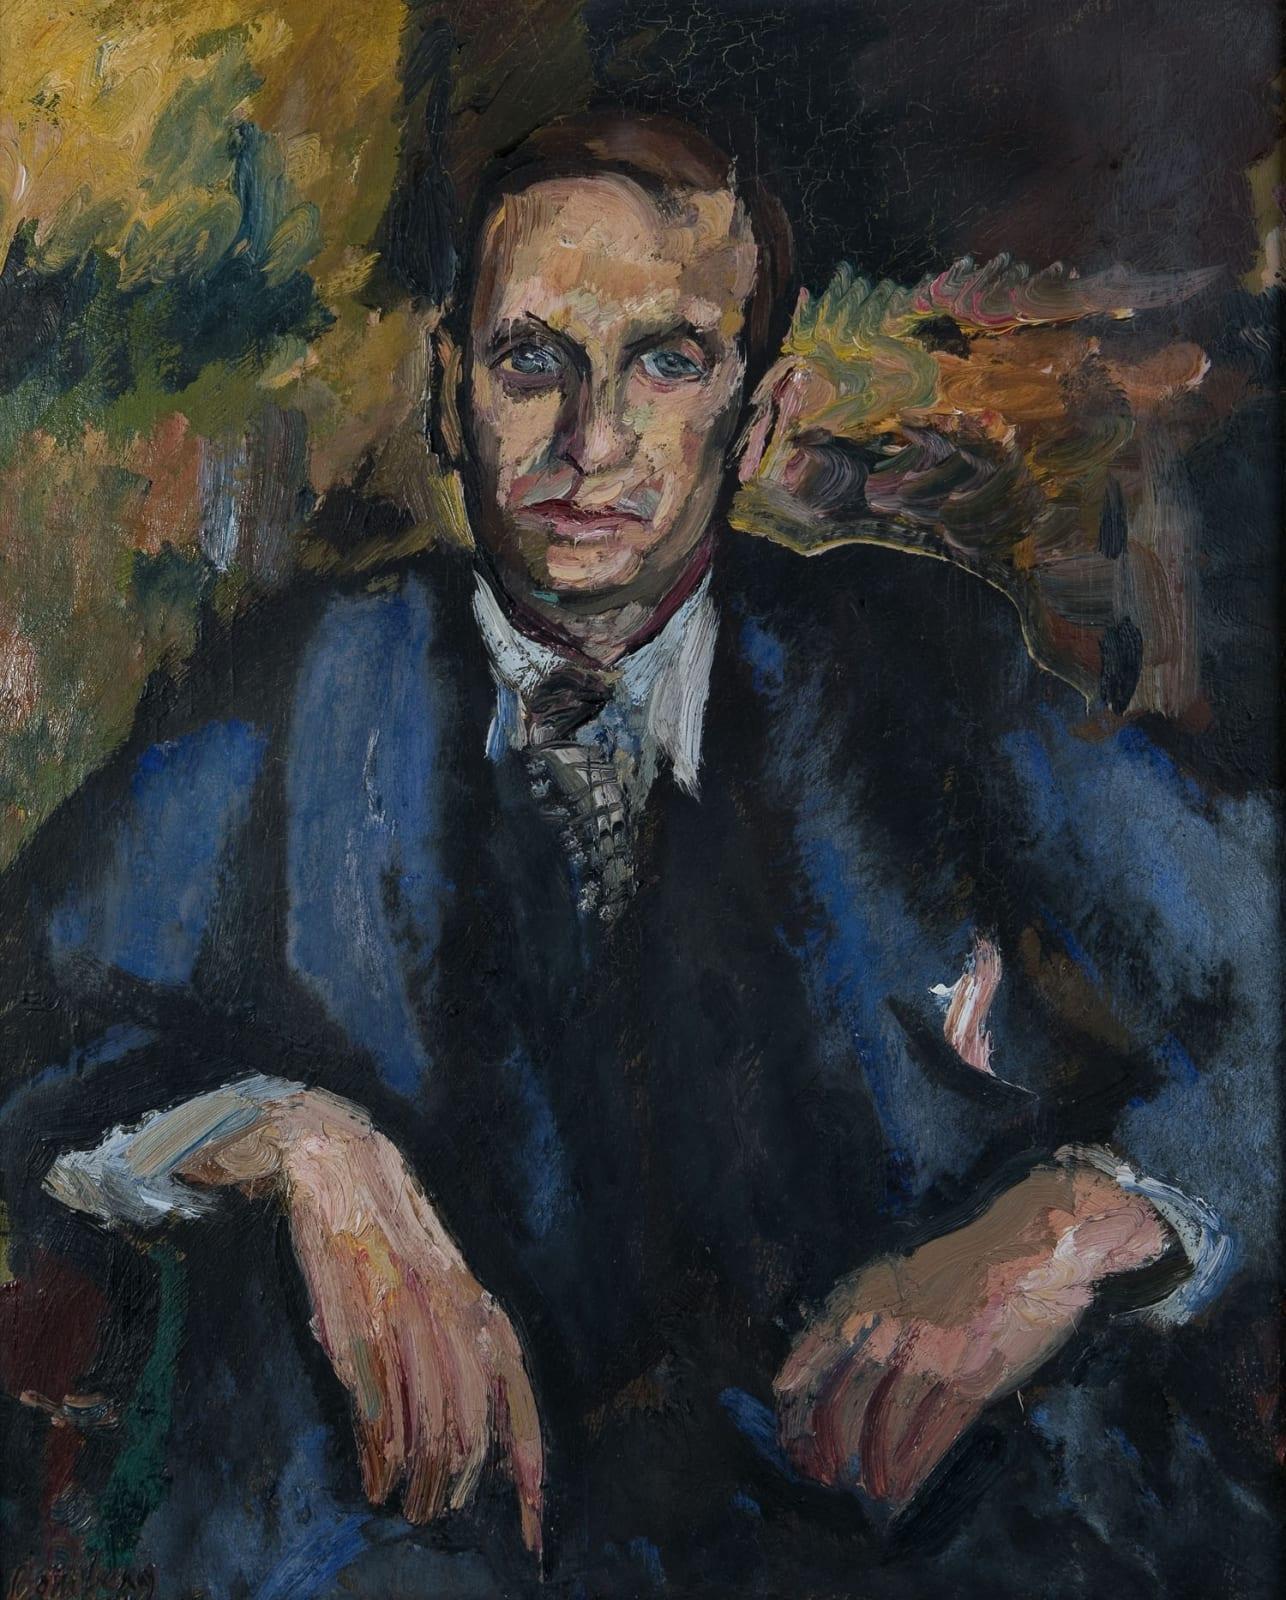 David Bomberg (1890-1957) Portrait of John Rodker c.1931 Oil on canvas 71.5 x 57 cm Ben Uri Collection © David Bomberg estate